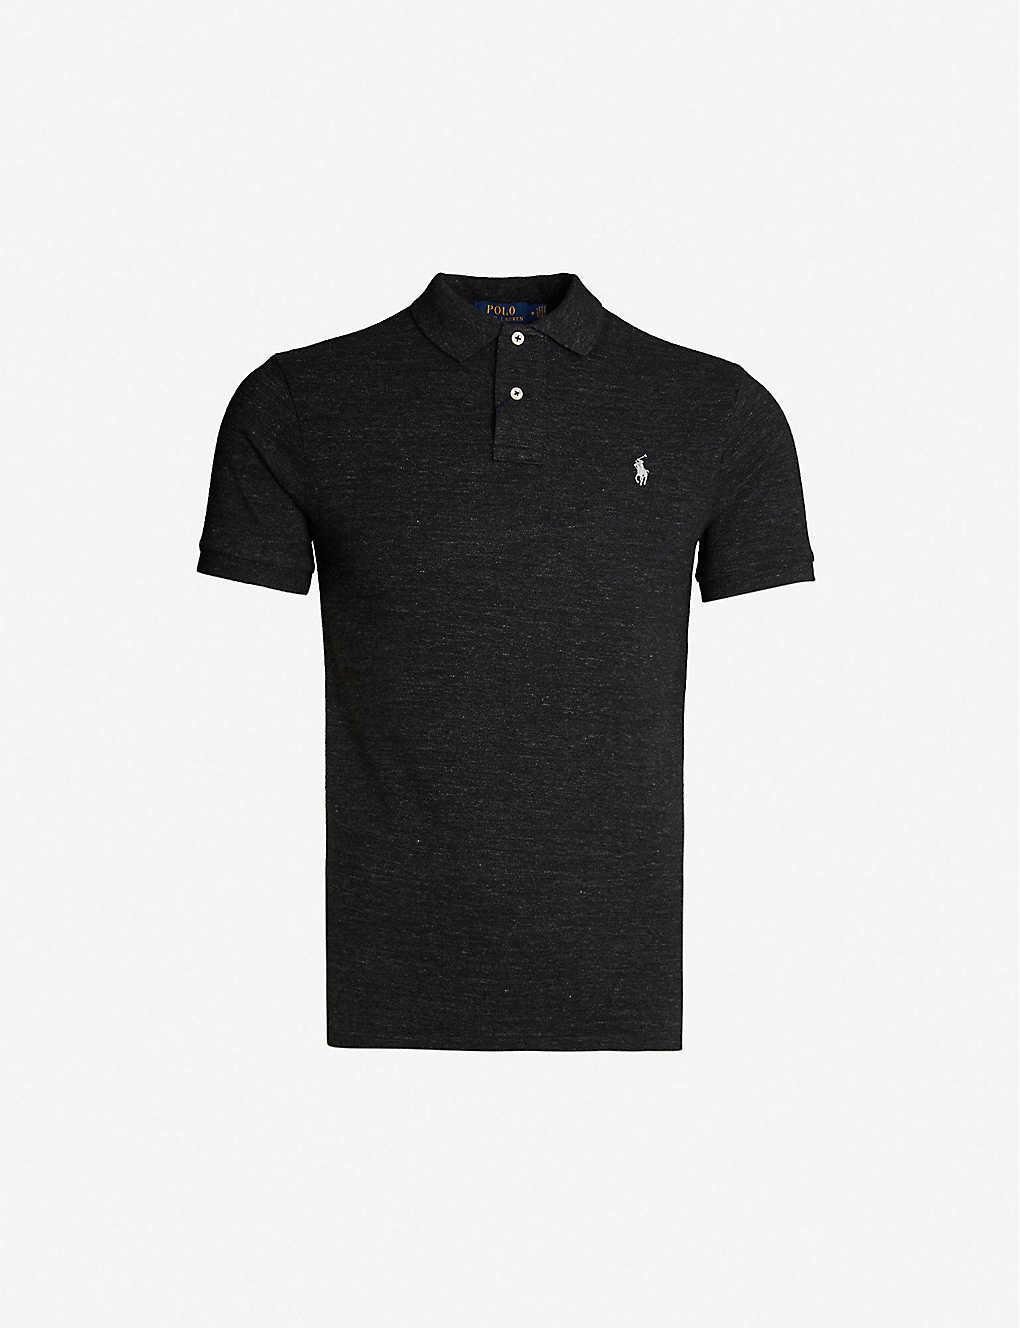 911dea927 Logo-embroidered slim-fit cotton polo shirt - Black marl heather ...